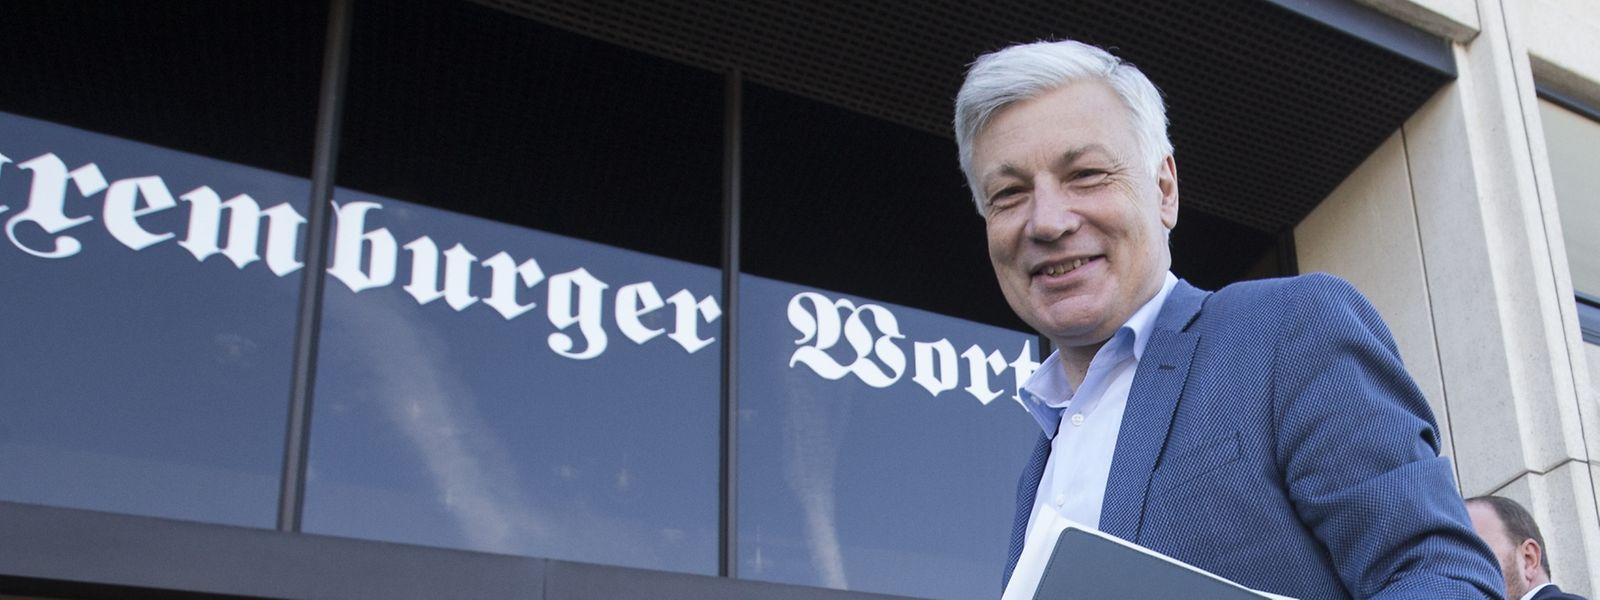 Chefredakter fir een Dag Claude Wiseler in der Redaktion des Luxemburger Wort.